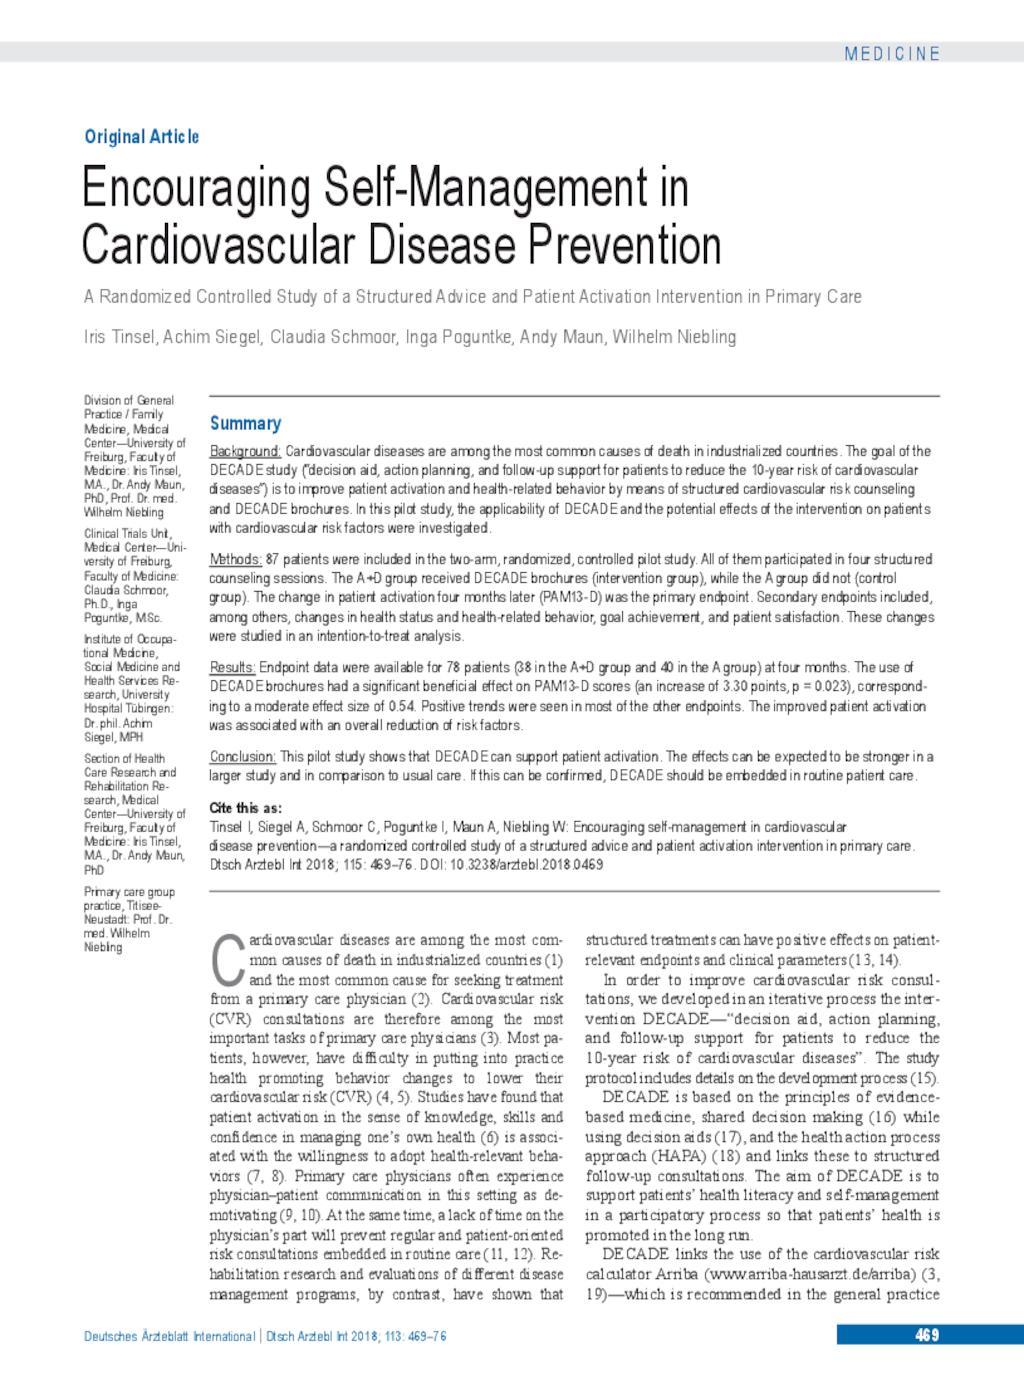 Encouraging Self-Management in Cardiovascular Disease